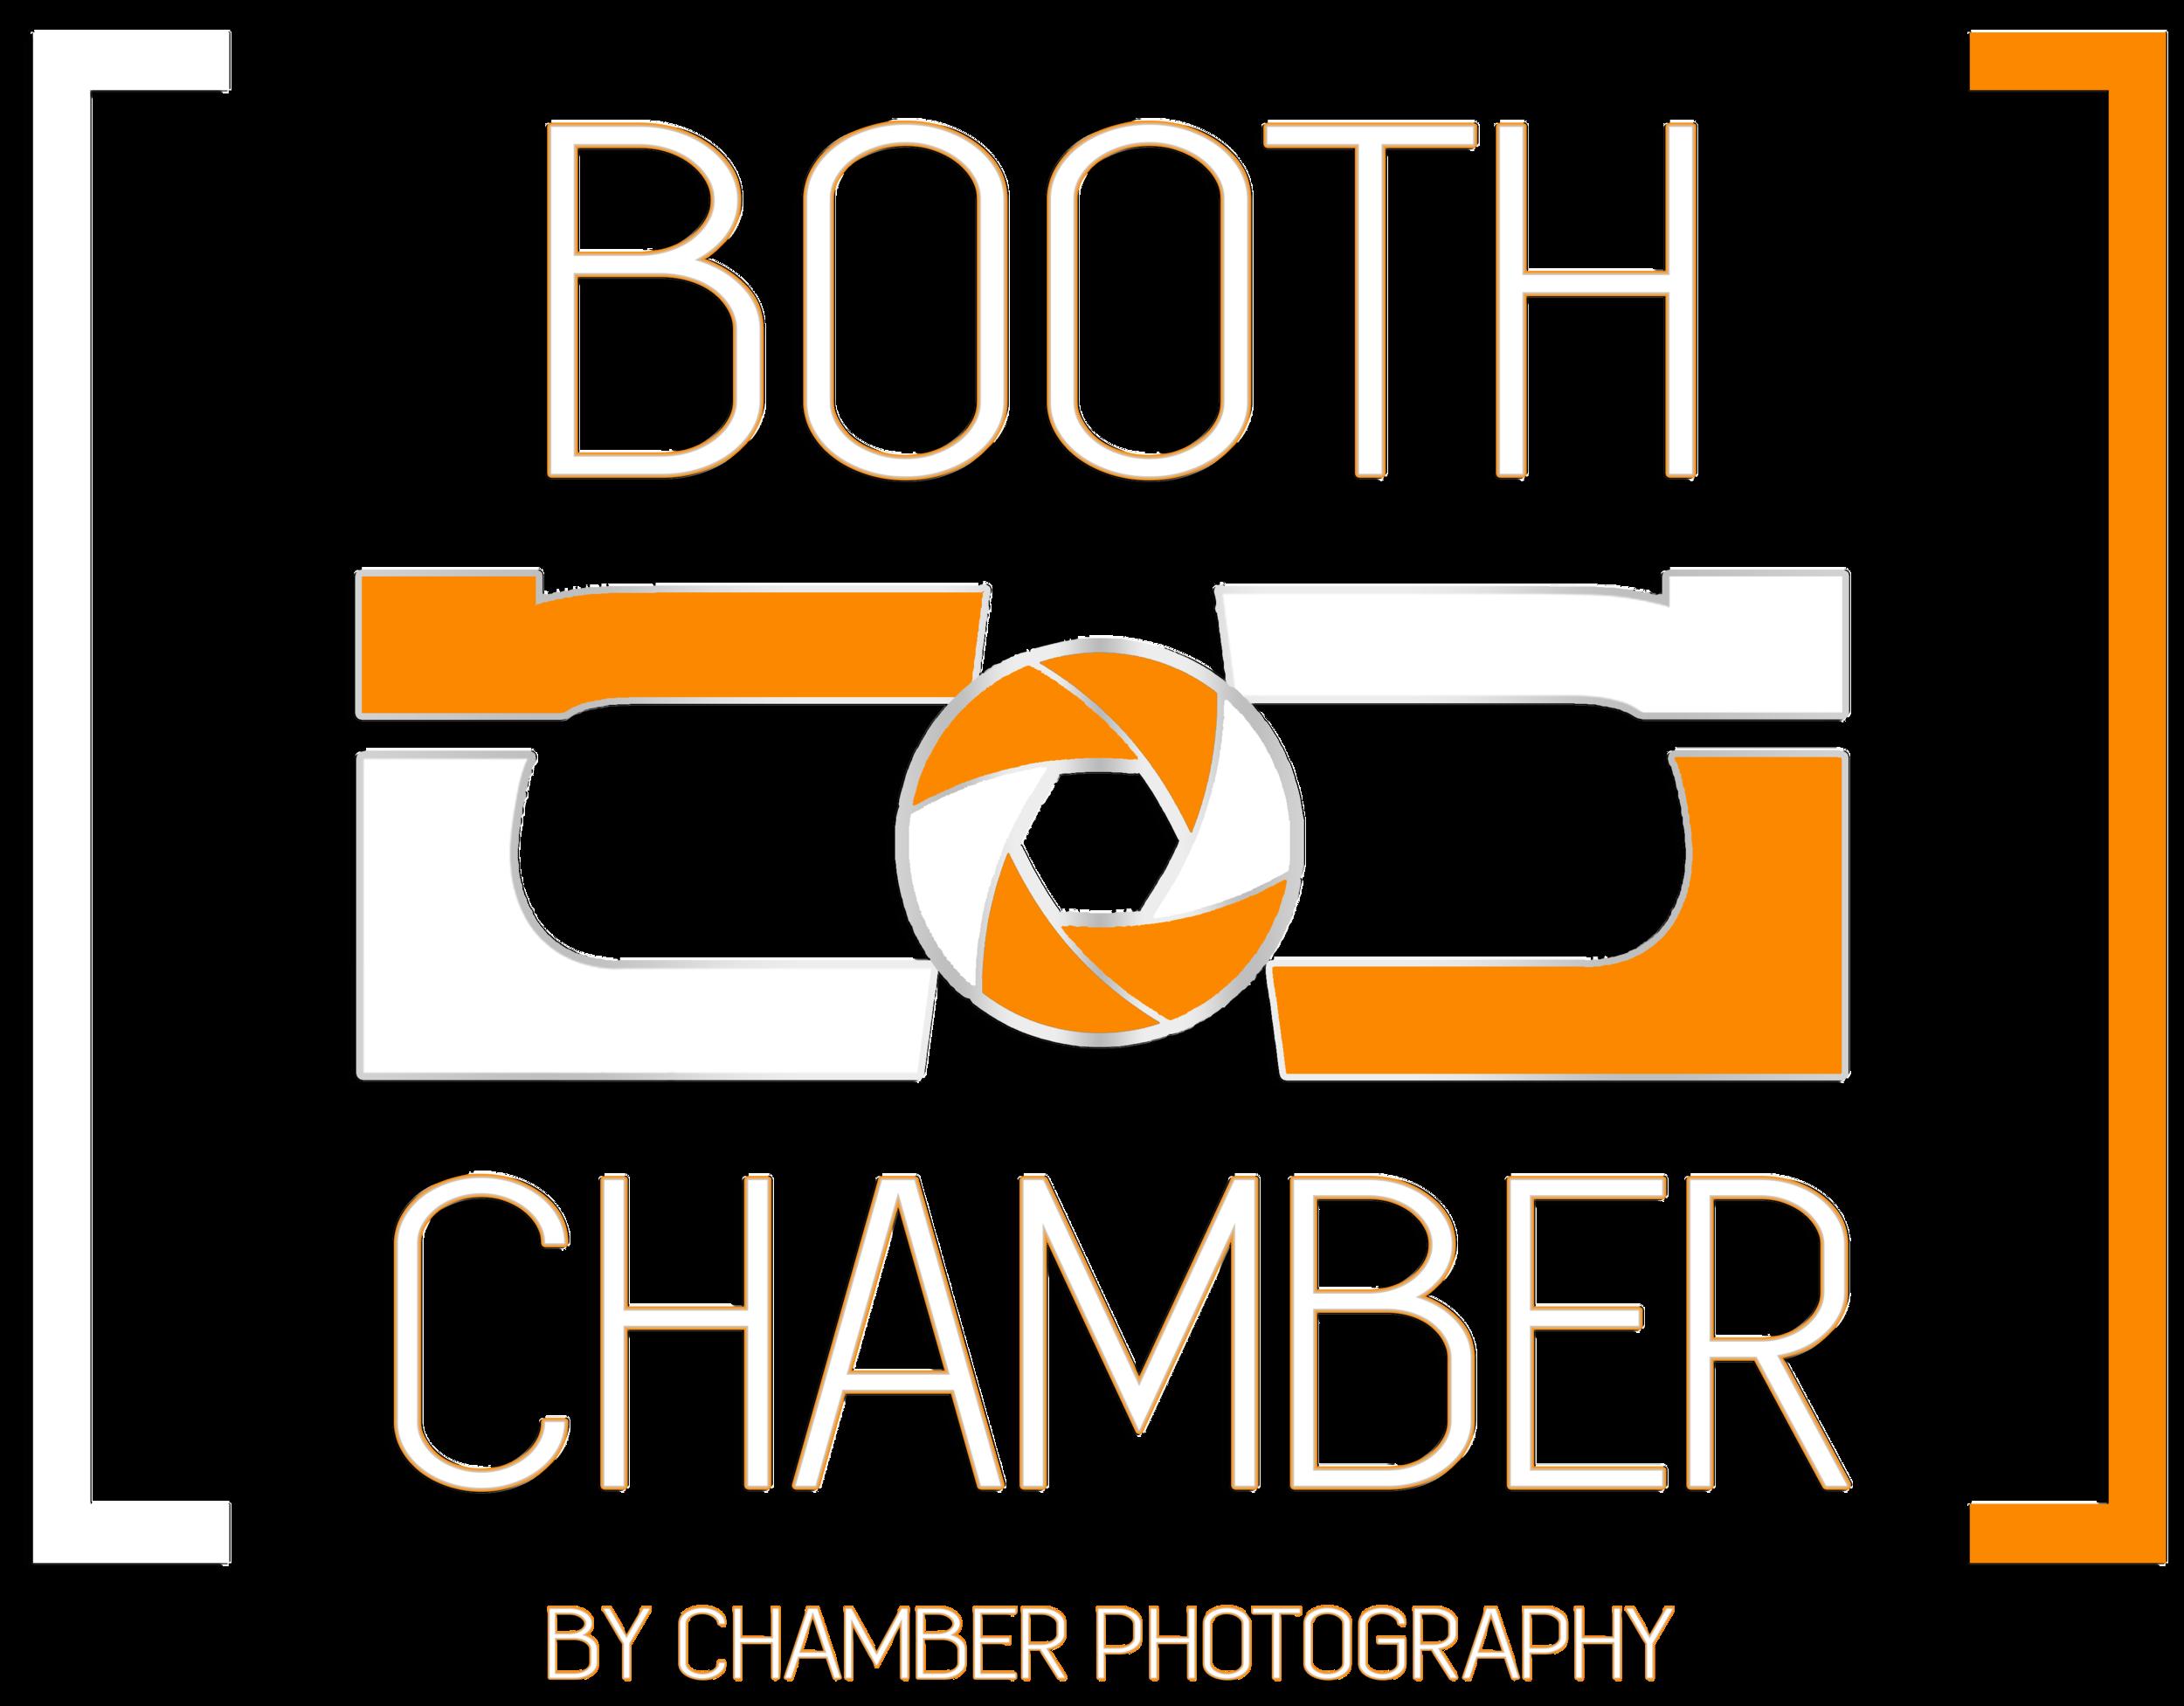 booth chamber logo ALT crop 1.png